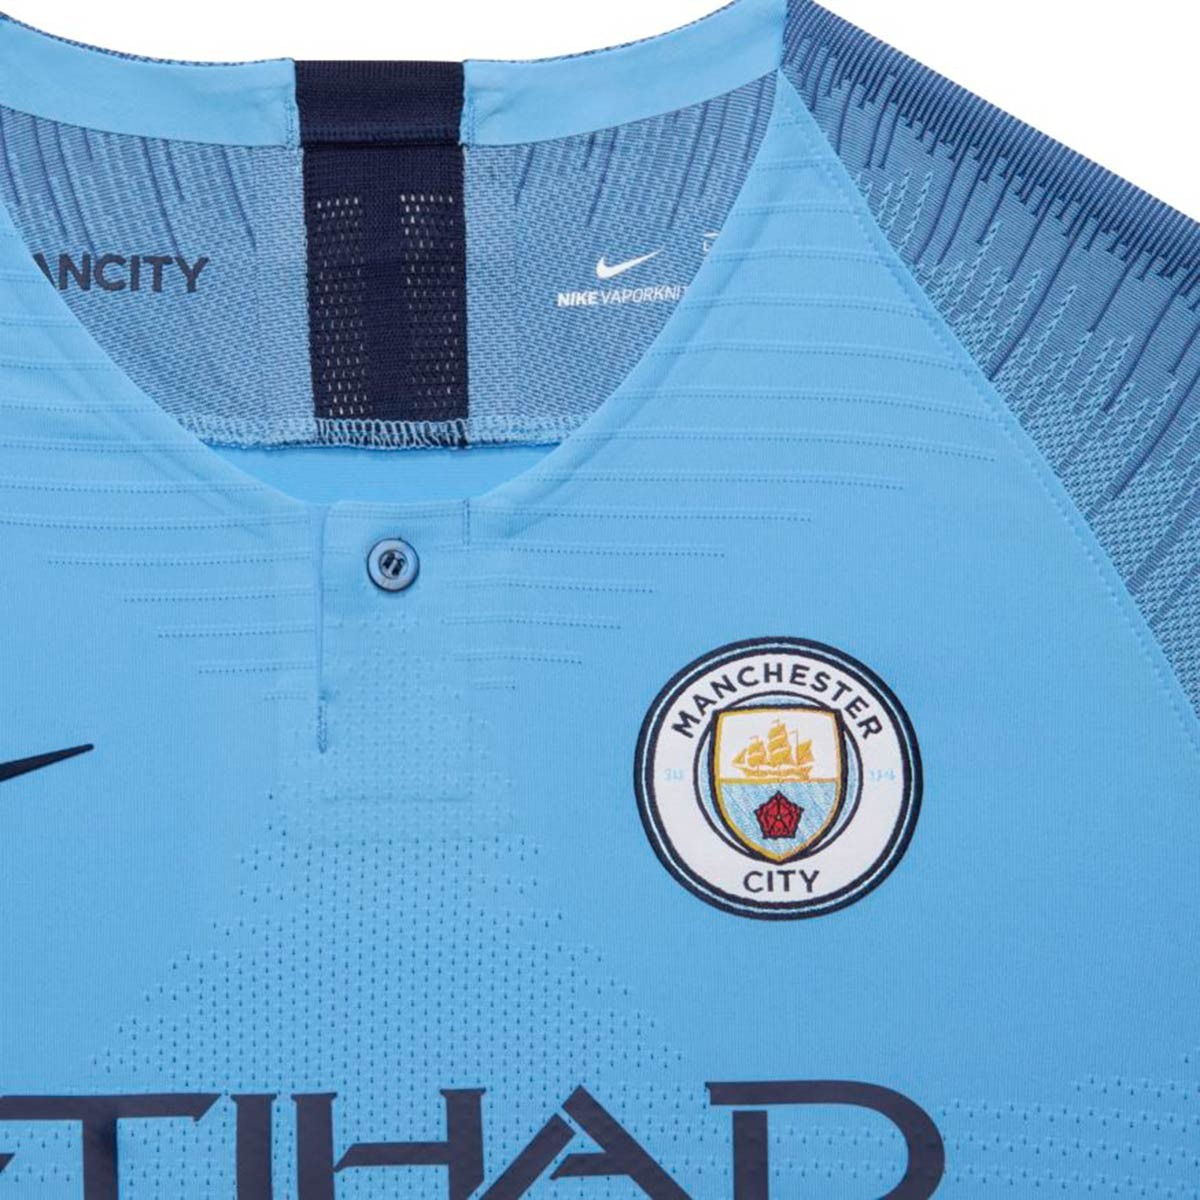 ed77d56c19686 Jersey Nike Kids Manchester City FC Vapor 2018-2019 Home Field  blue-Midnight navy - Tienda de fútbol Fútbol Emotion